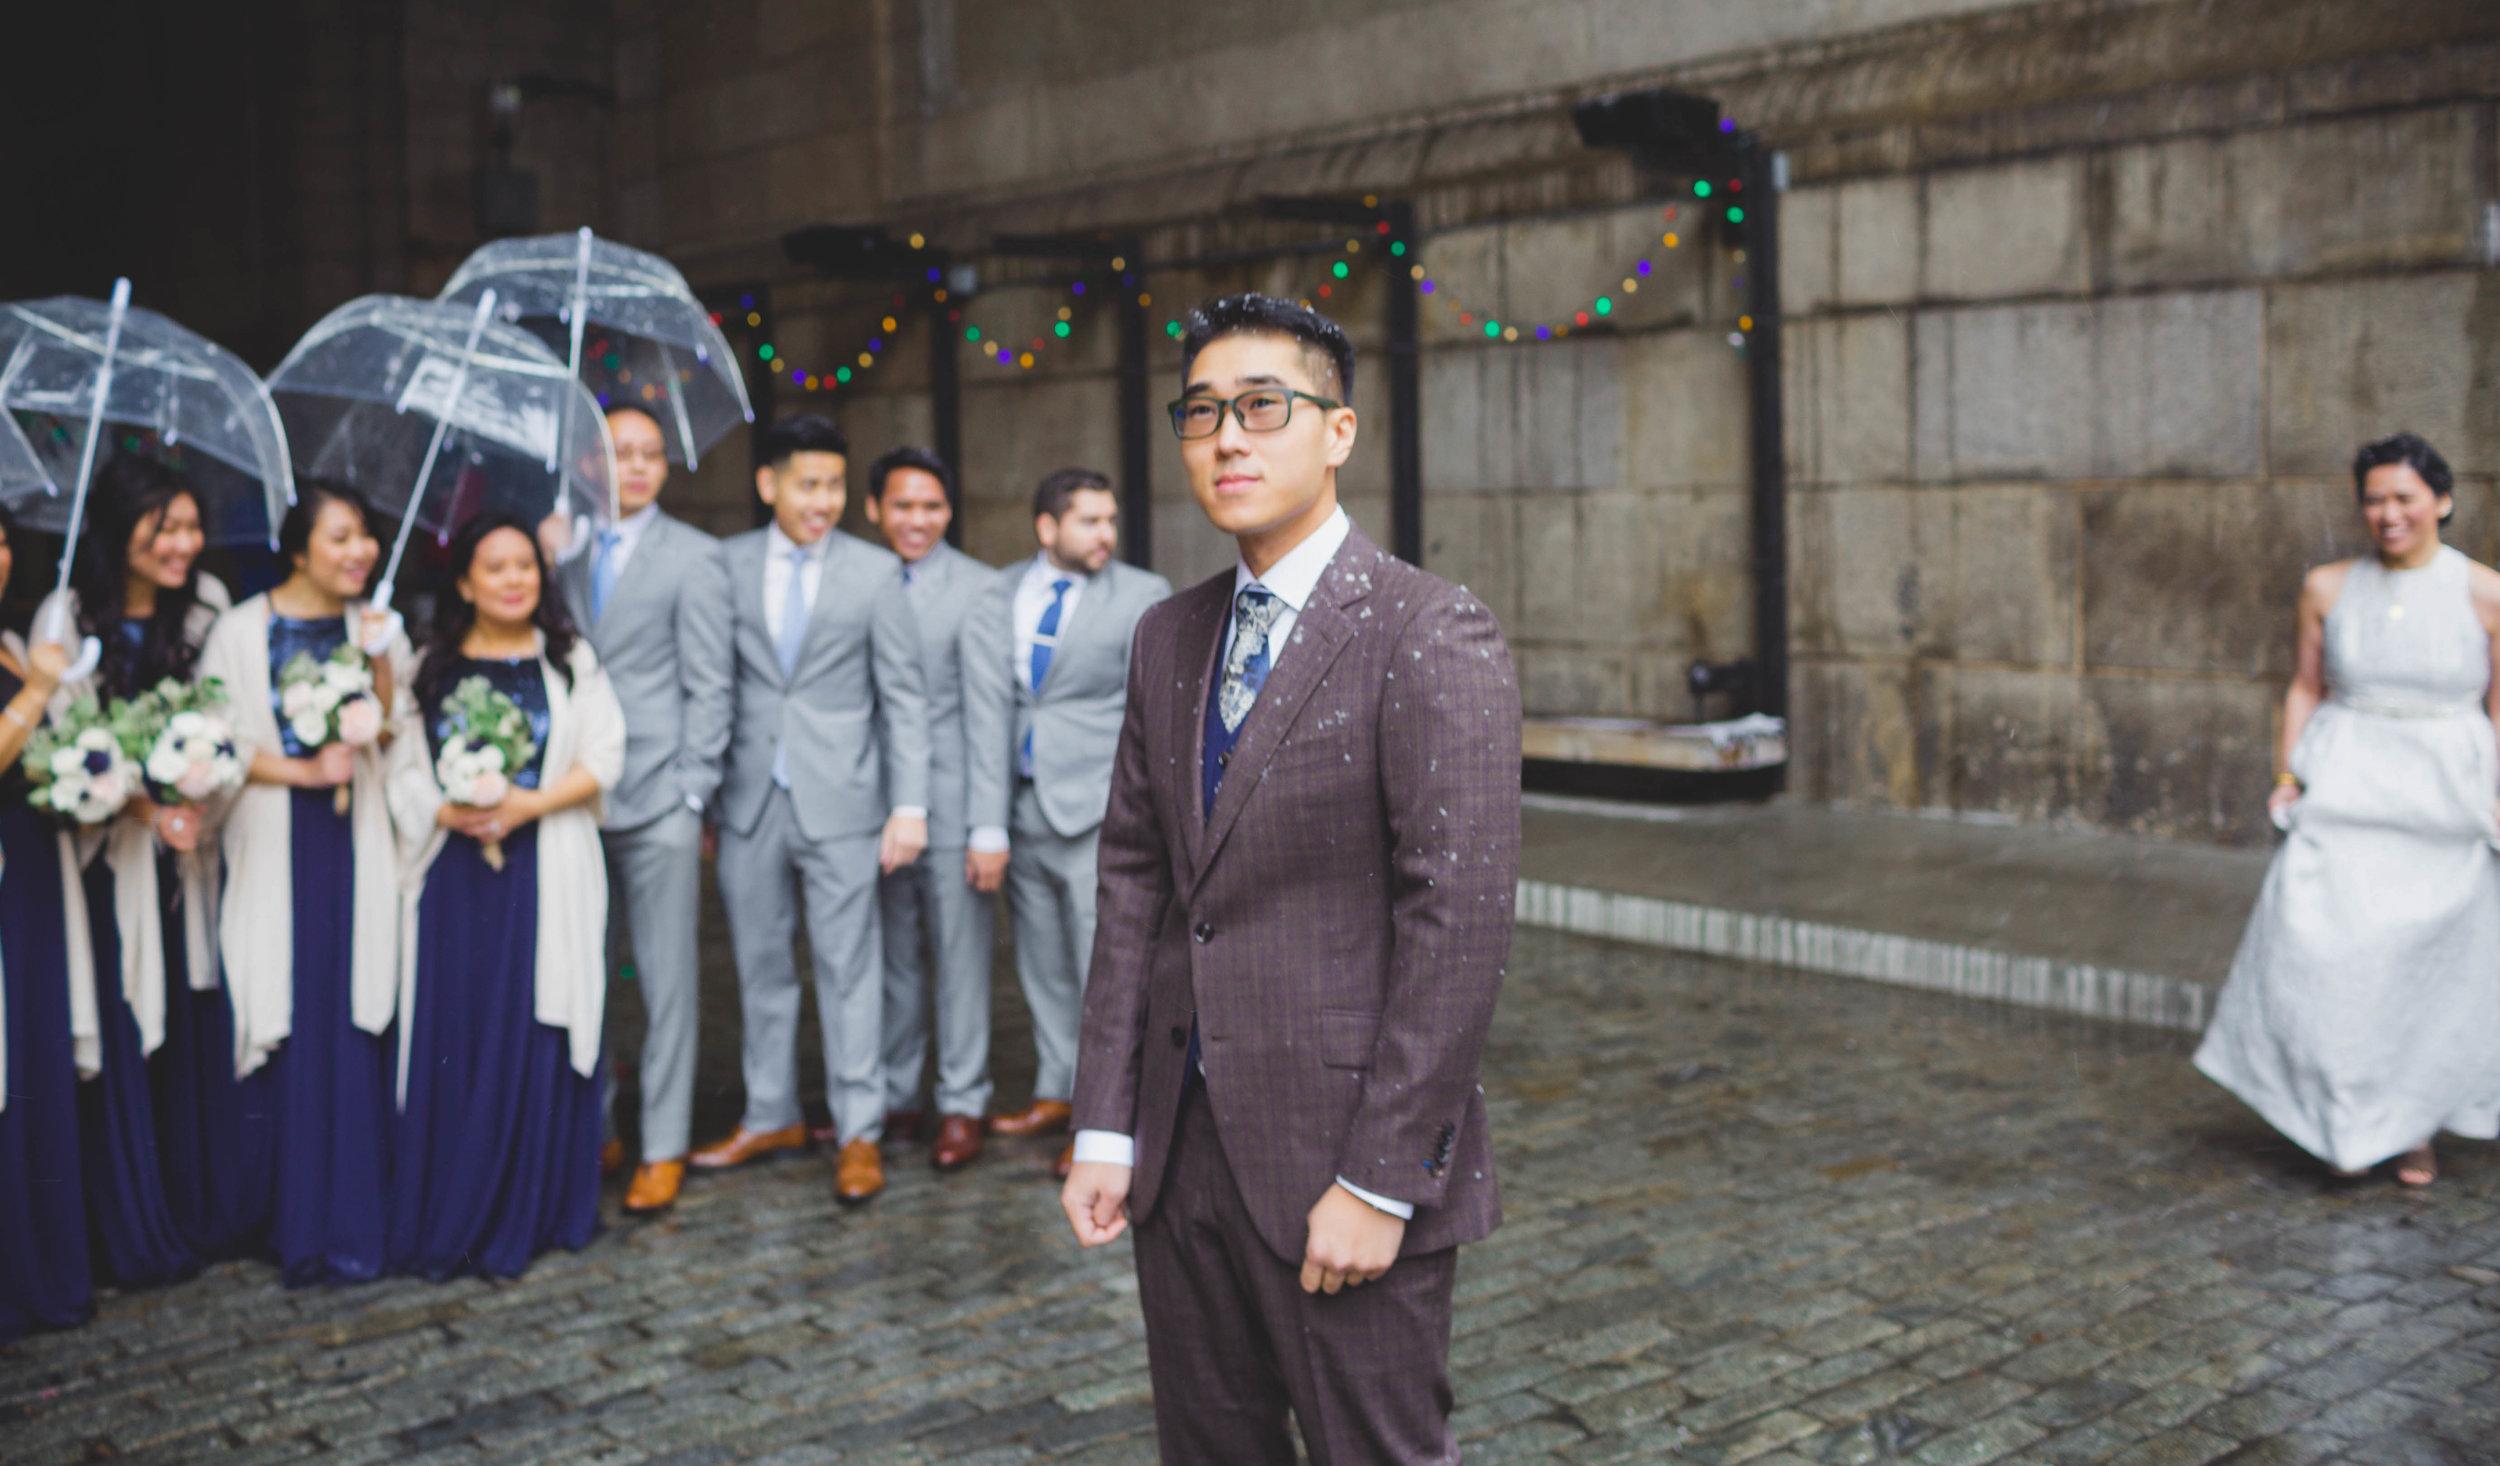 DUMBO December Wedding 2017 Under Manhattan Bridge Snow (3 of 23).jpg